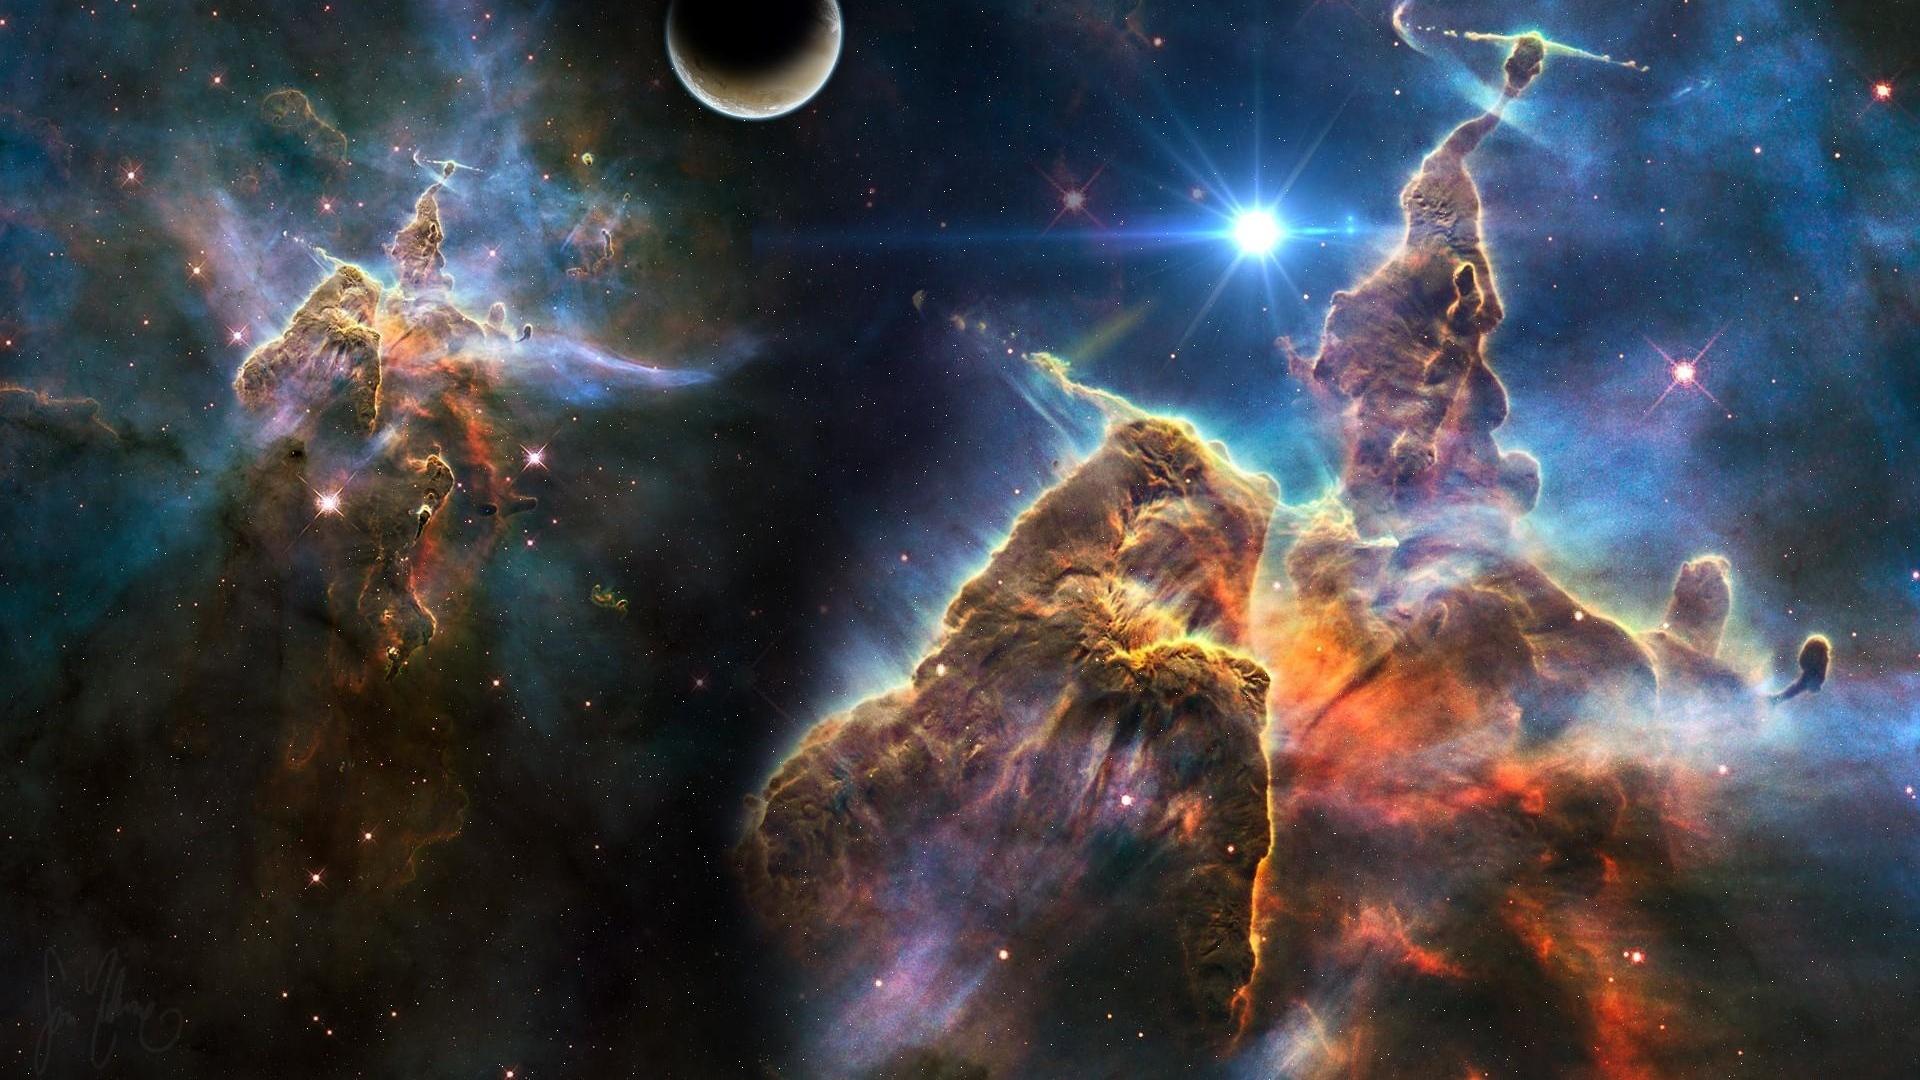 Download Wallpaper 1920x1080 Universe Stars Planets Nebulae